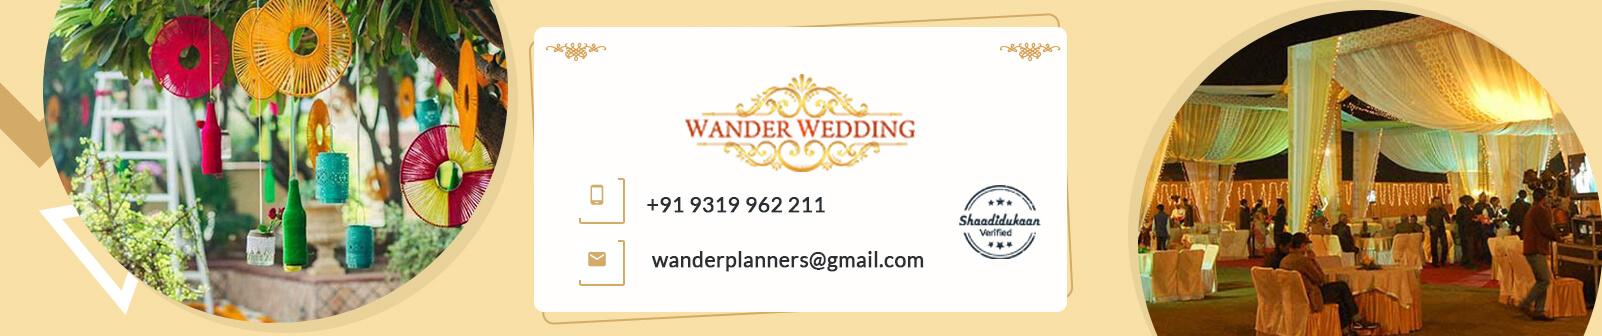 Wander Weddings-3